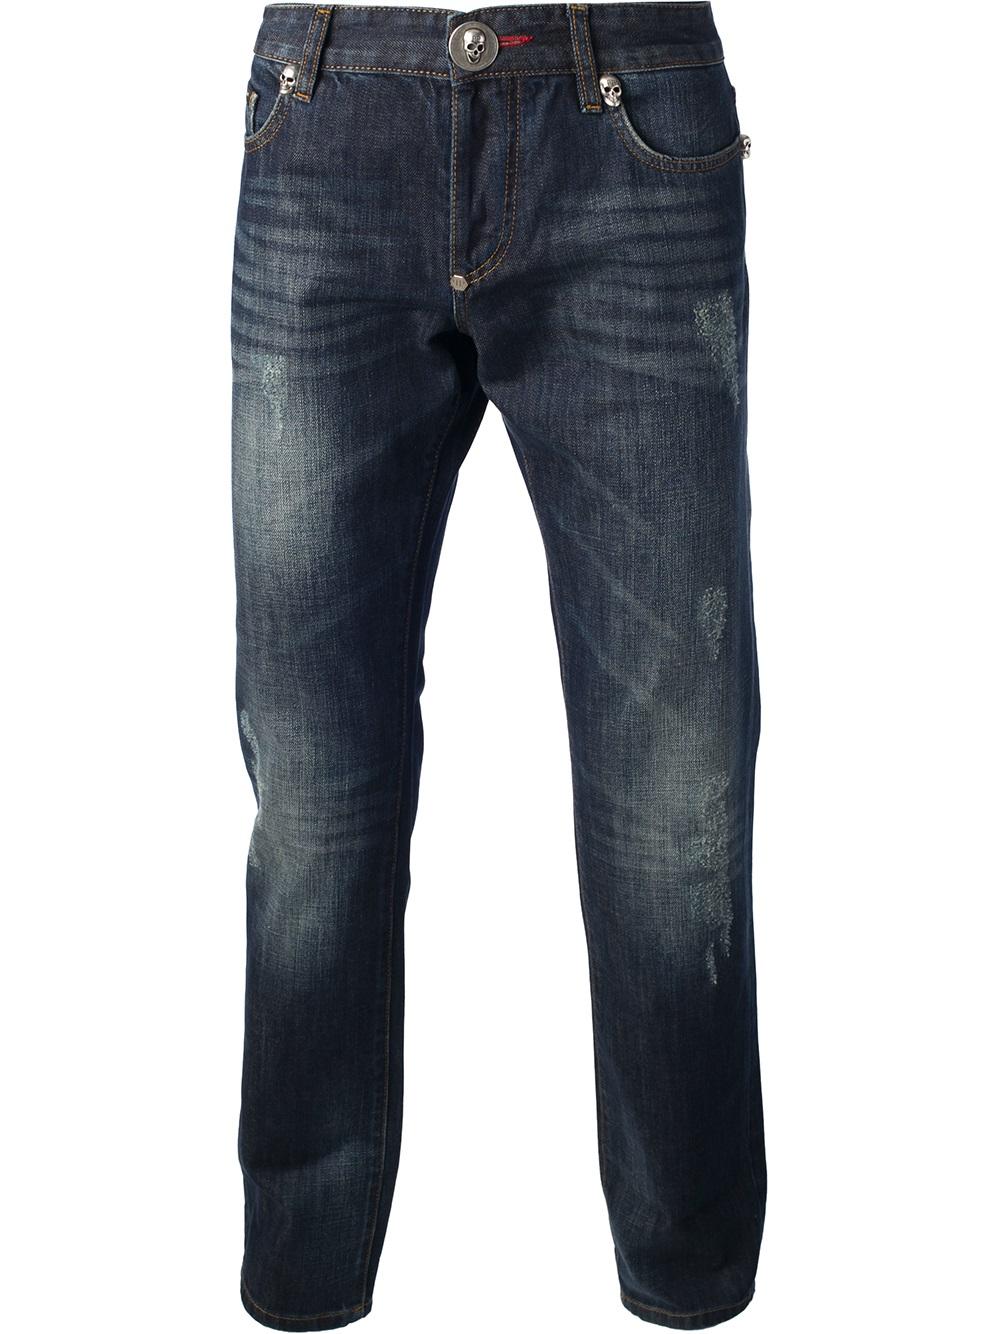 philipp plein skull detail jeans in blue for men lyst. Black Bedroom Furniture Sets. Home Design Ideas